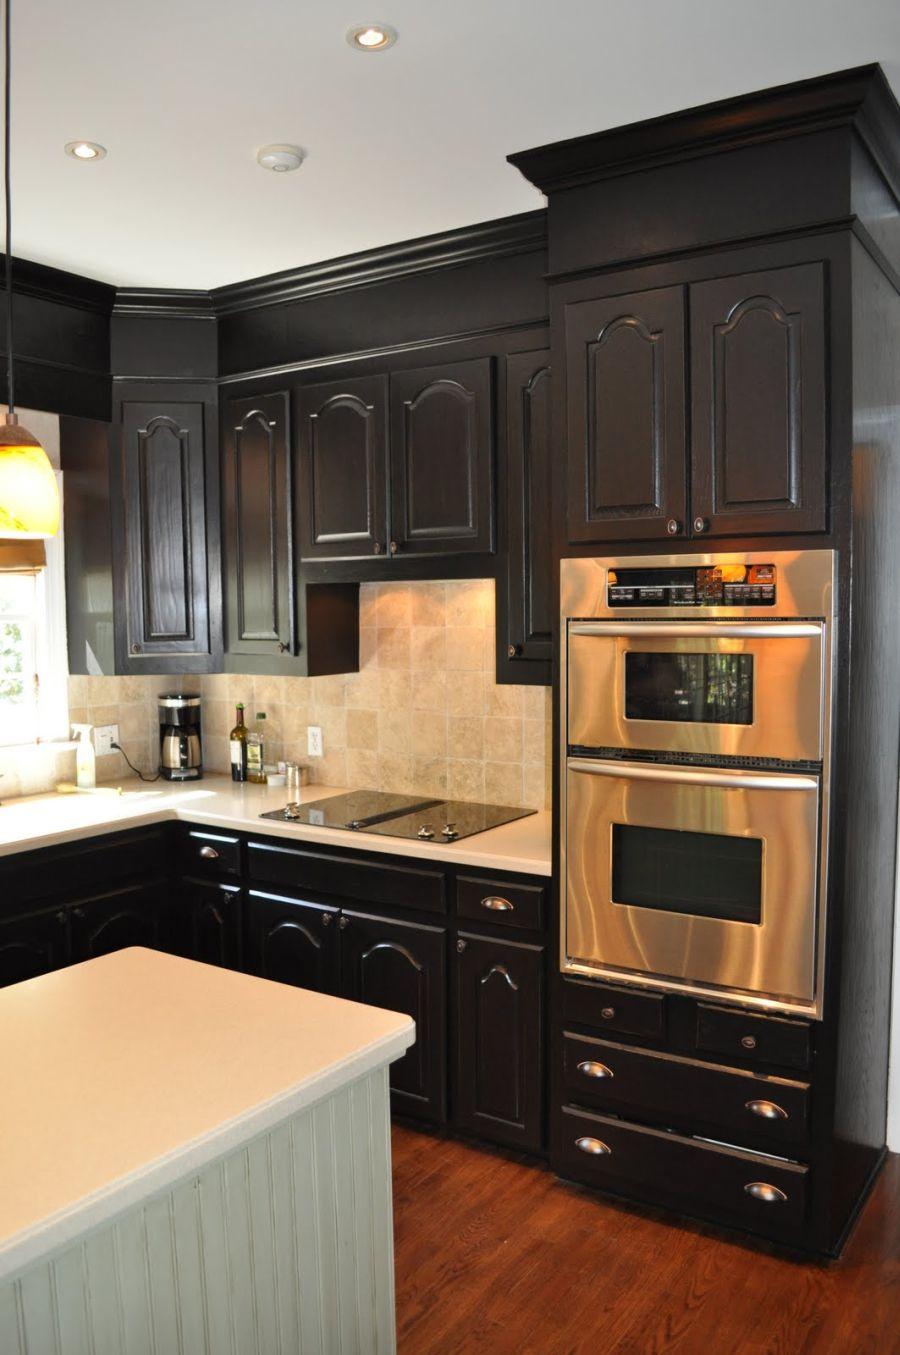 black kitchen cabinets images photo - 2